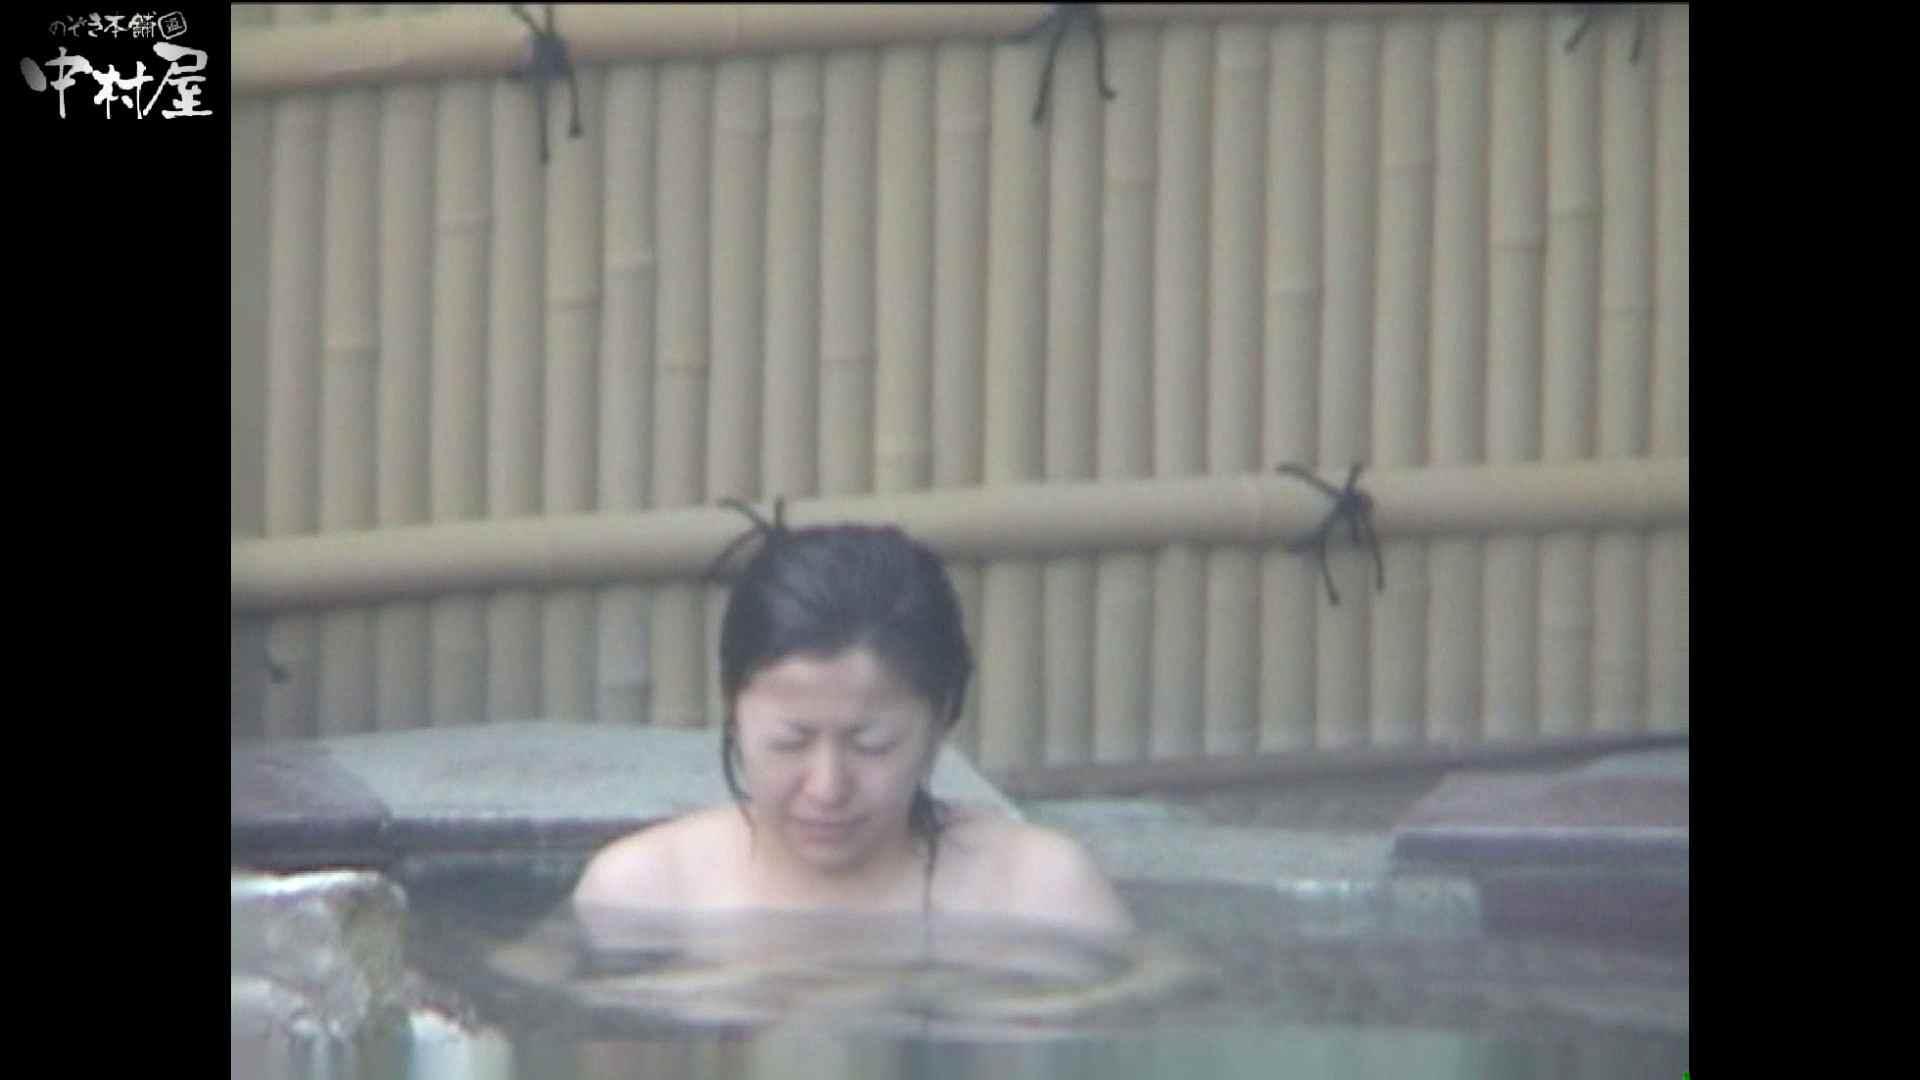 Aquaな露天風呂Vol.986 盗撮特撮 ワレメ動画紹介 13pic 5